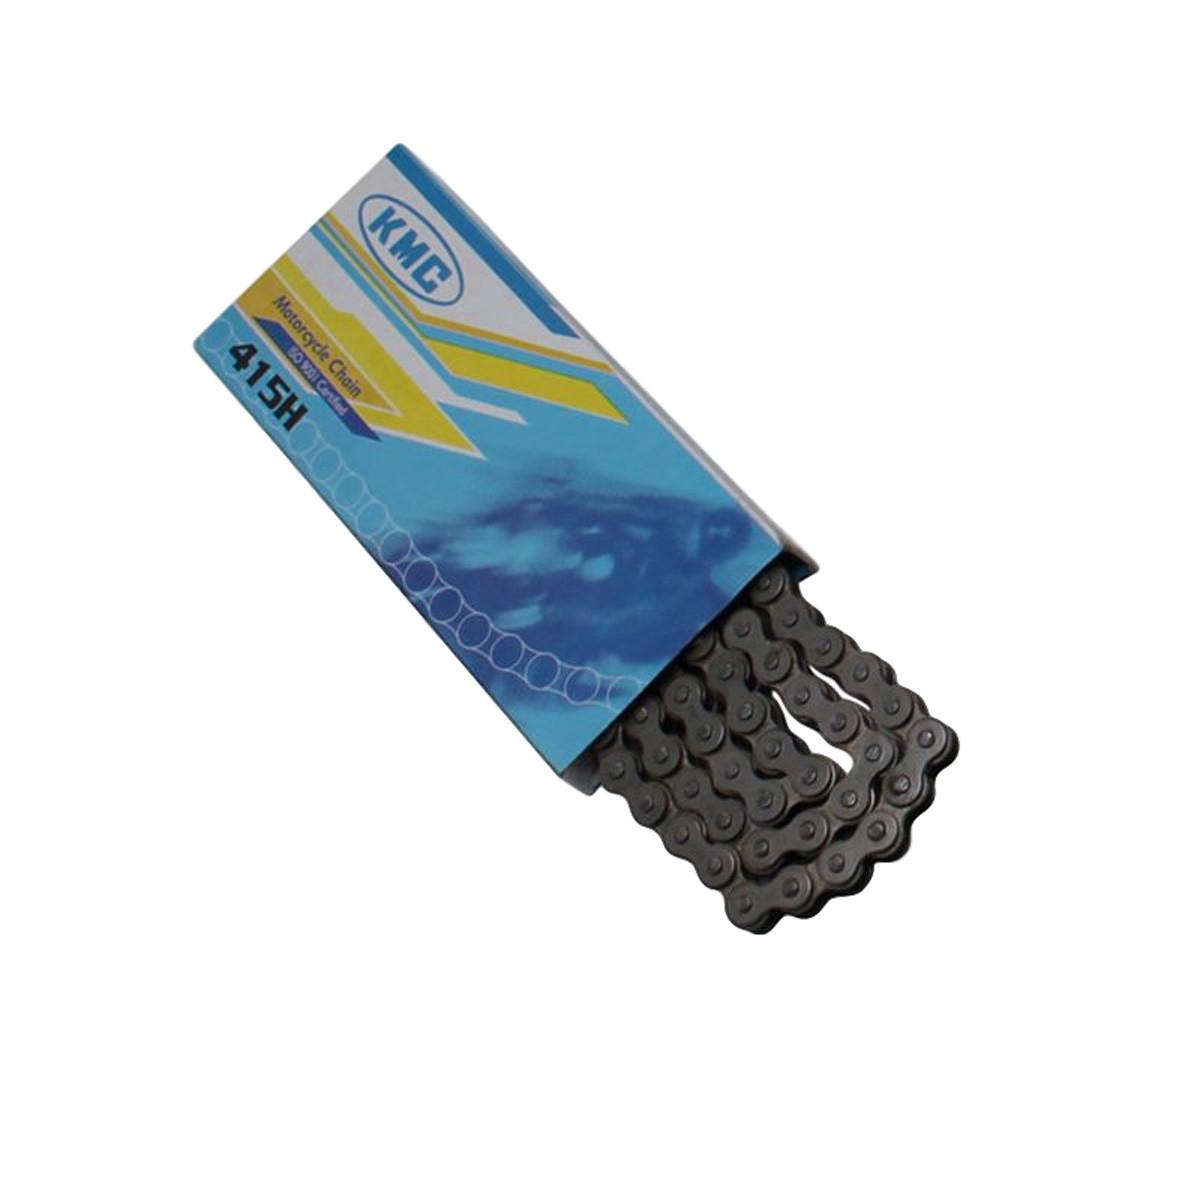 Chaîne 415 108 Maillons - KMC Standard